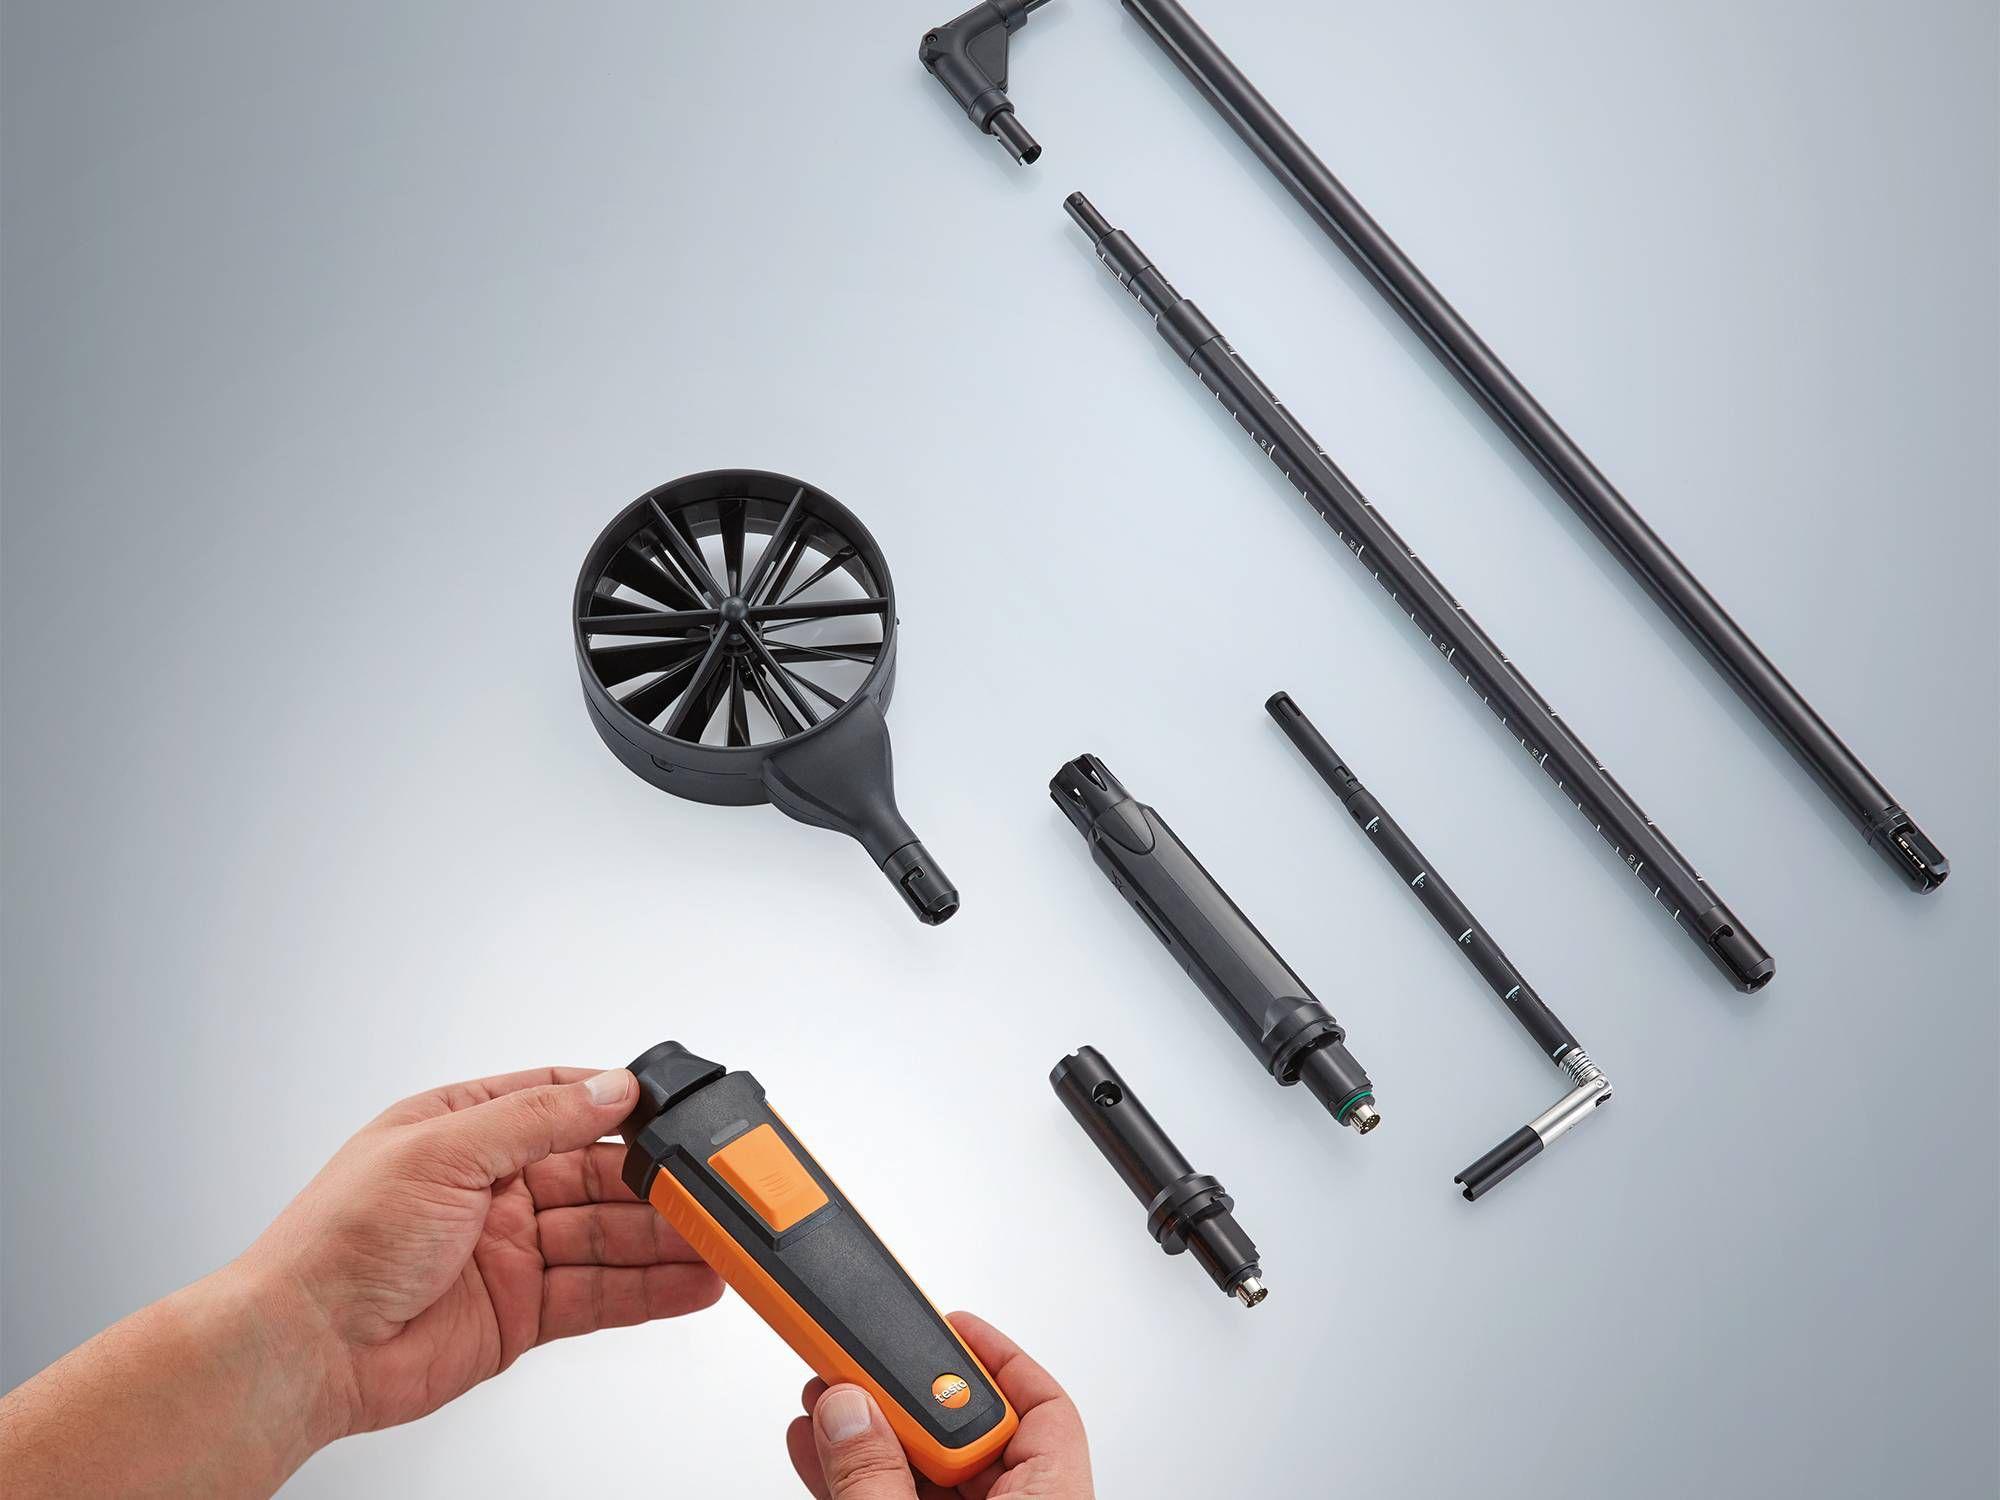 testo 440 handle